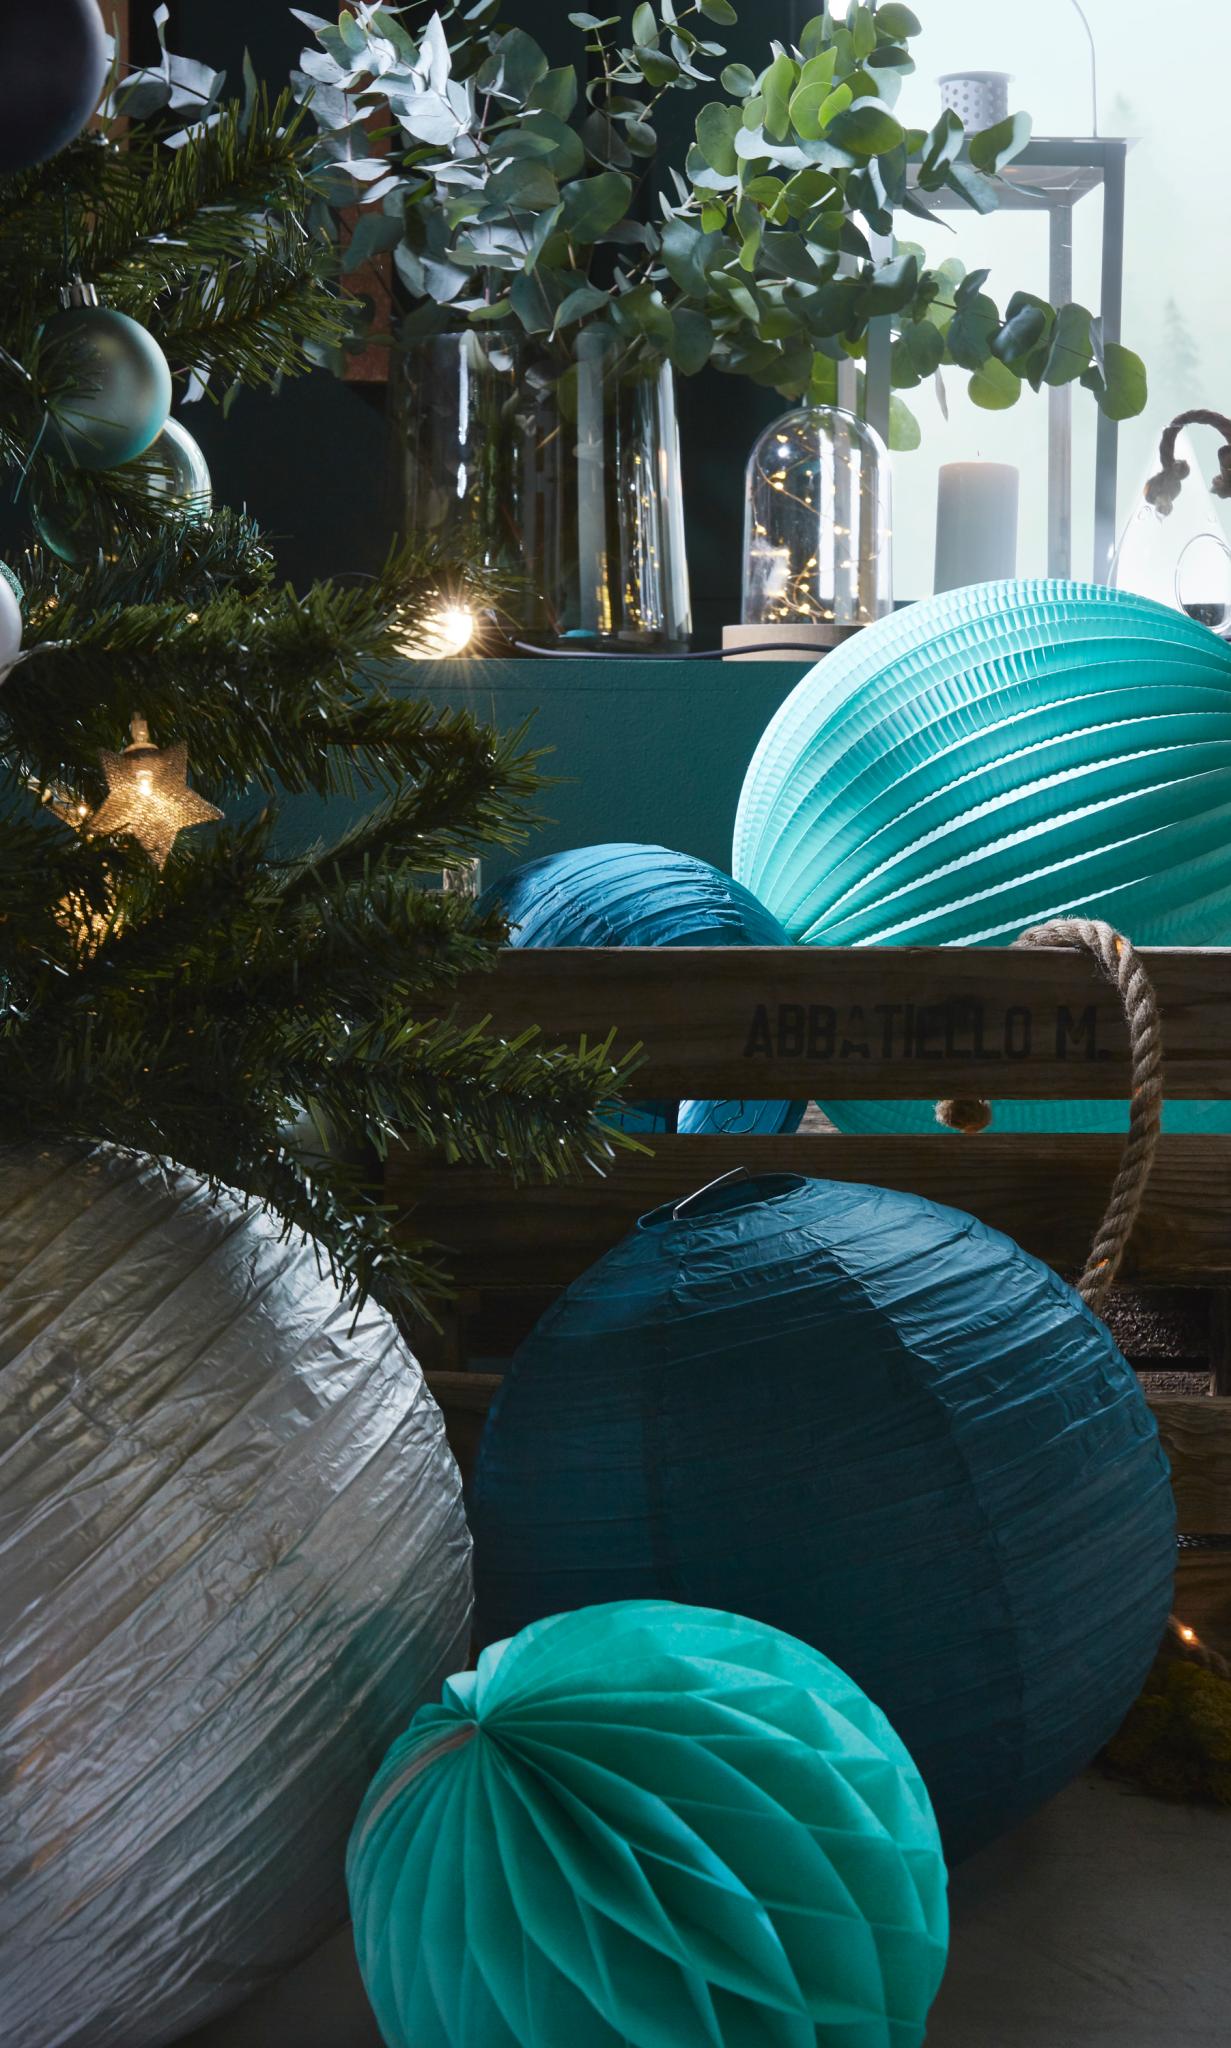 décoration noel tallinn skylantern bleu vert tendance 2017 2018